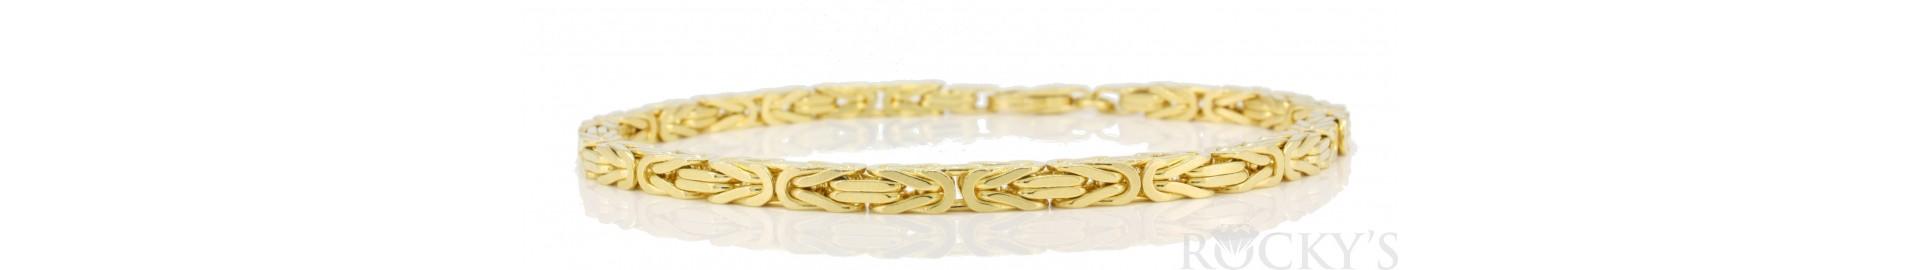 Plain Gold Bracelets and Anklets